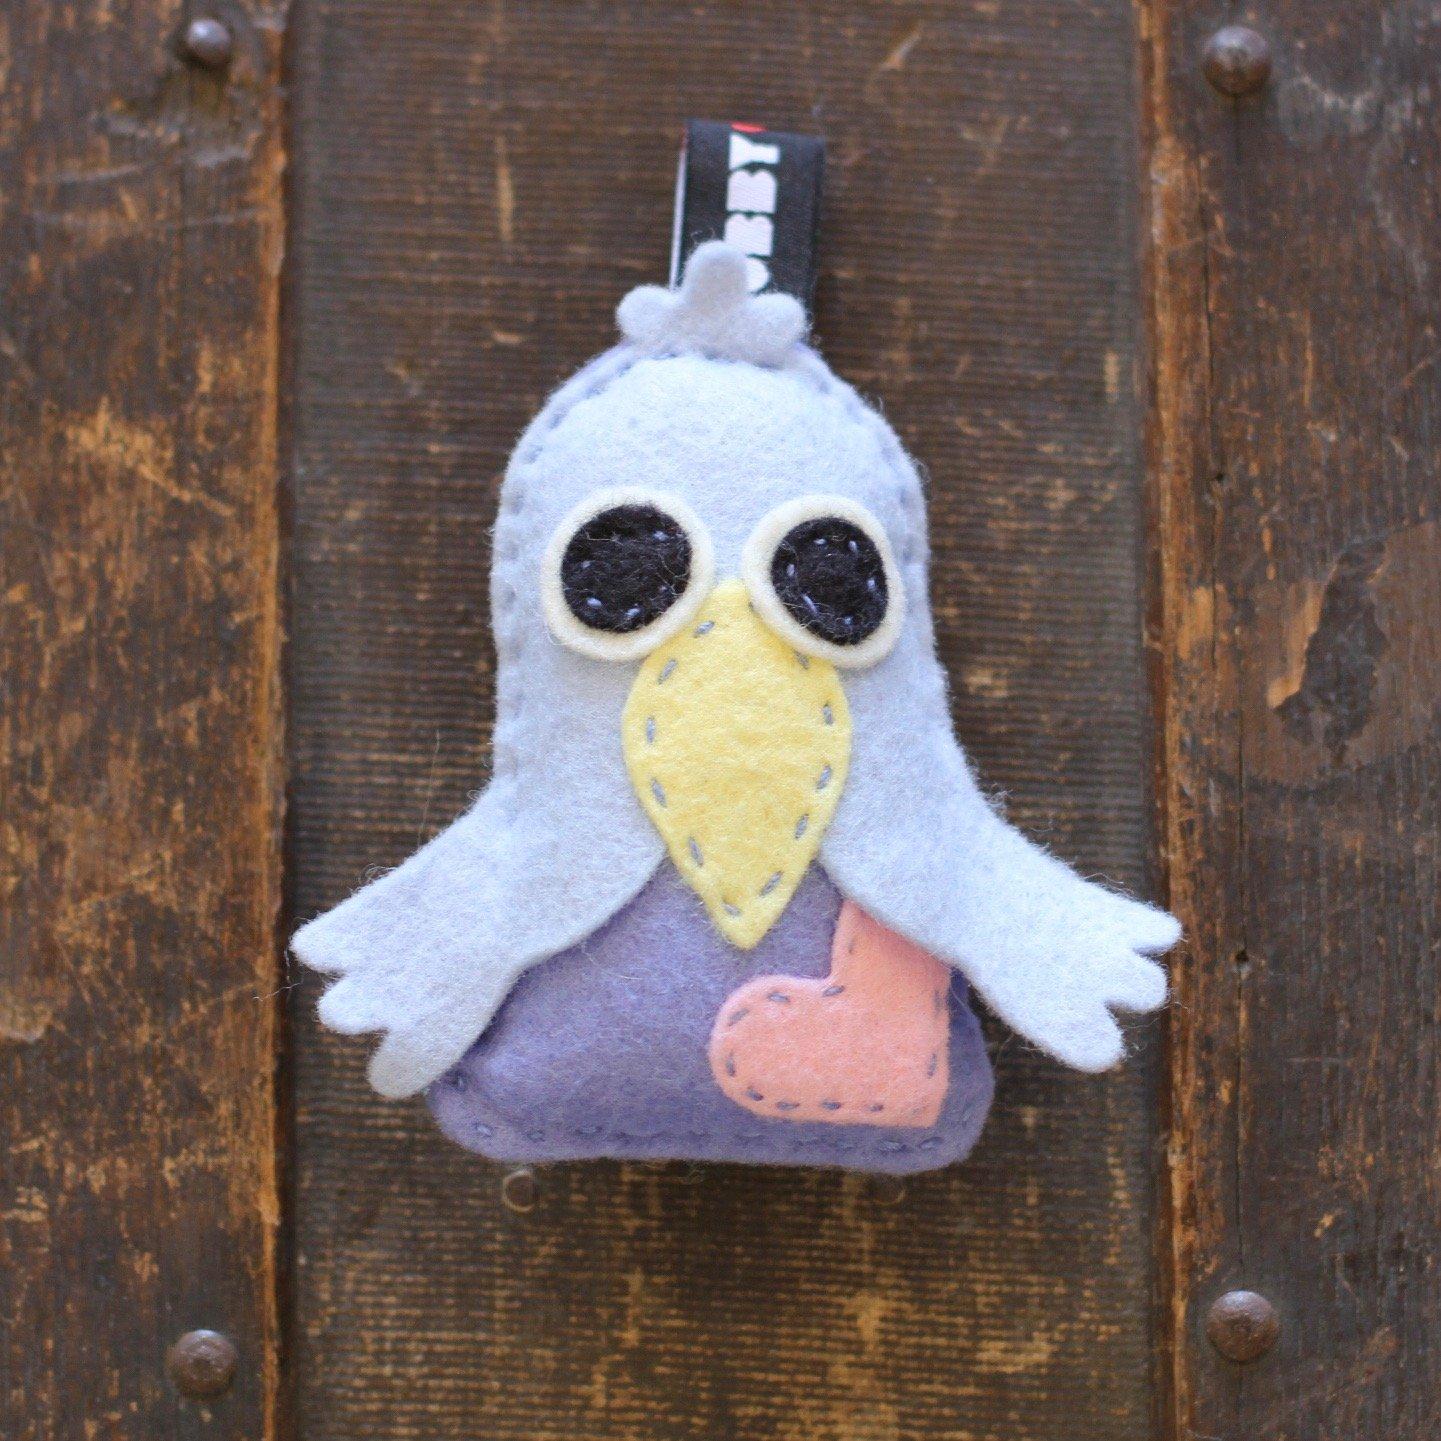 TubbyWubby Stitch & Stuff Critter Kit - Chip the Bluebird